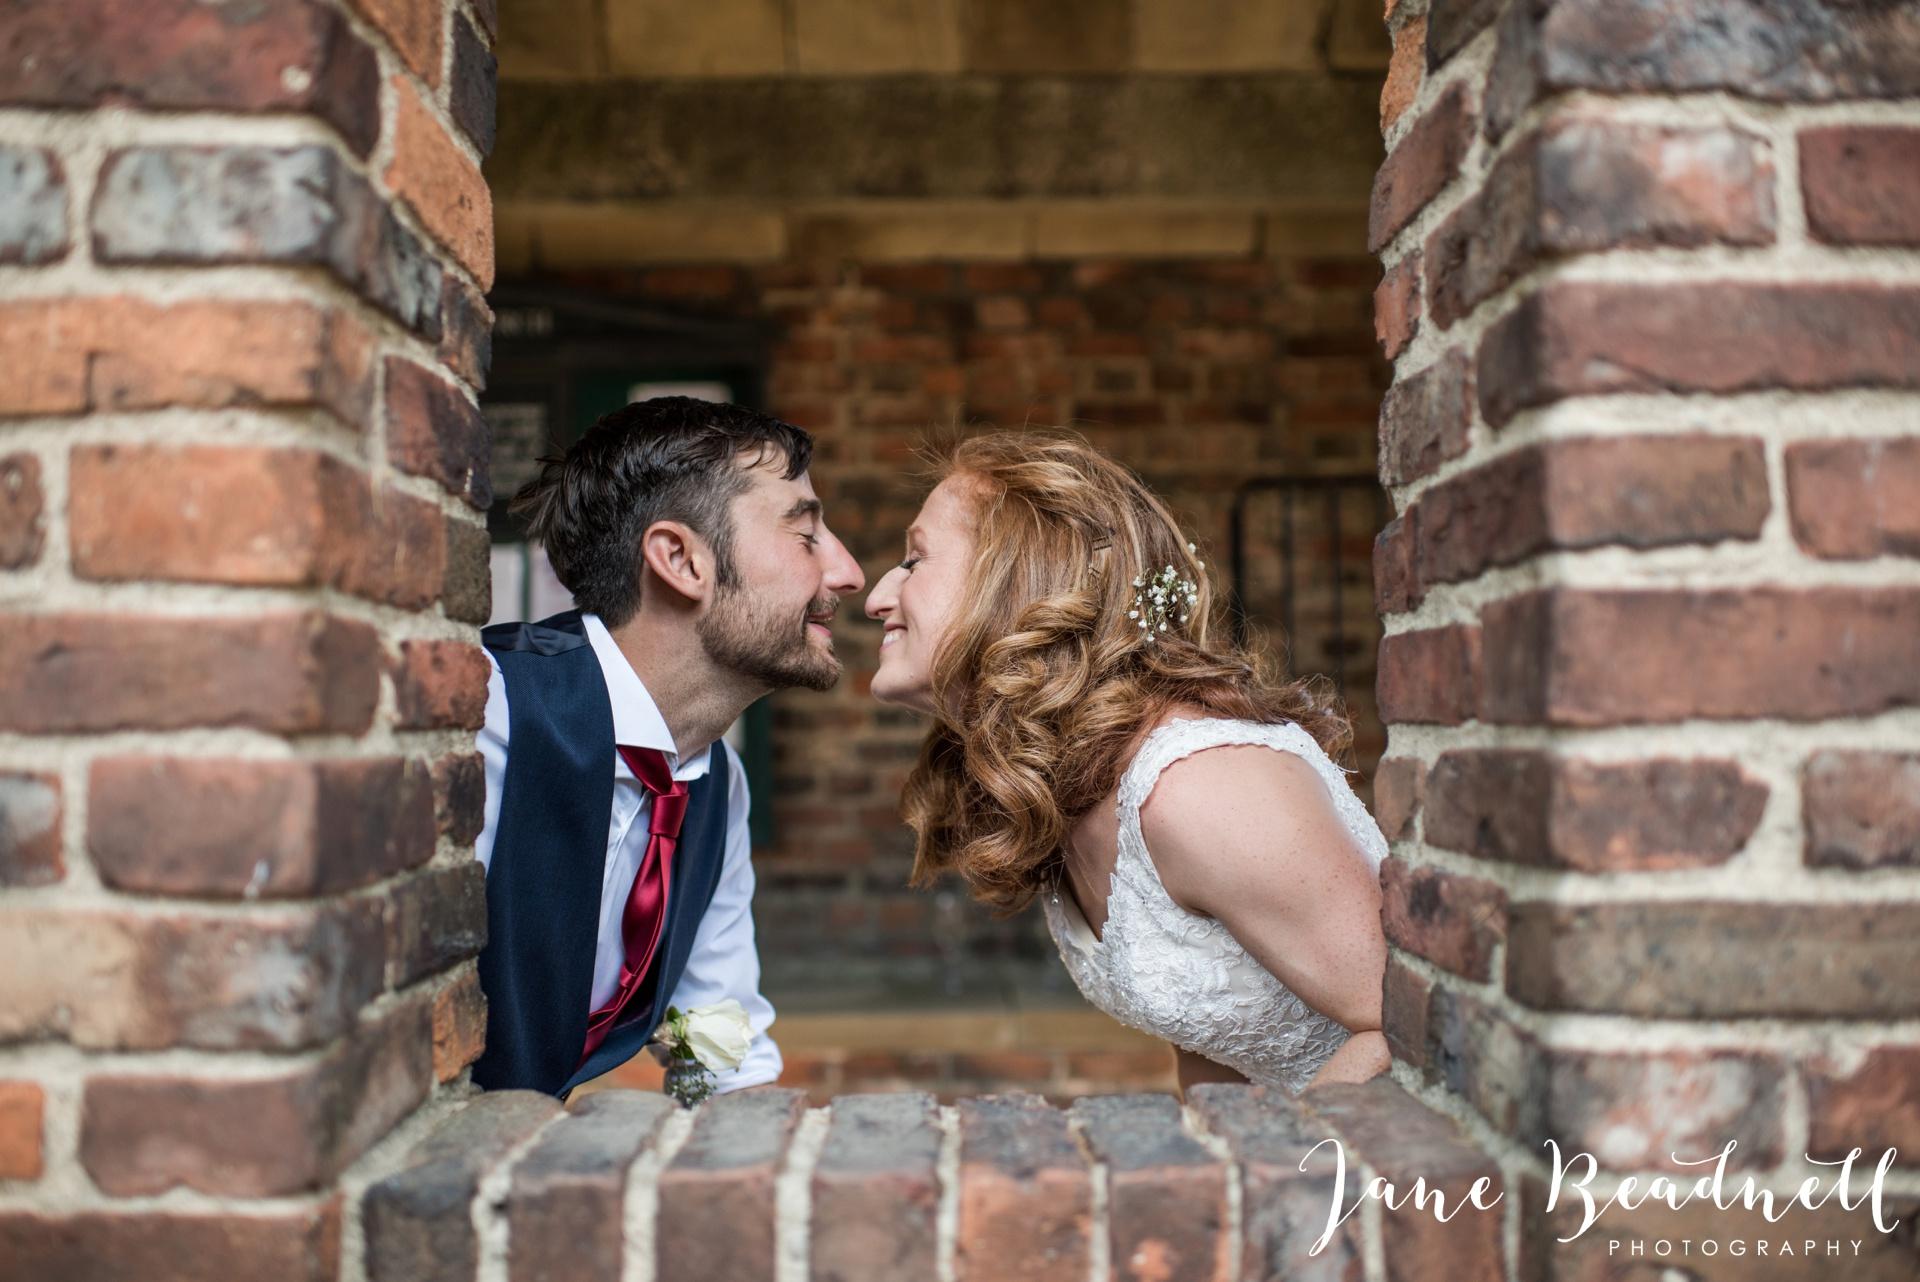 yorkshire-fine-art-wedding-photographer-jane-beadnell-photography-poppleton-york_0120